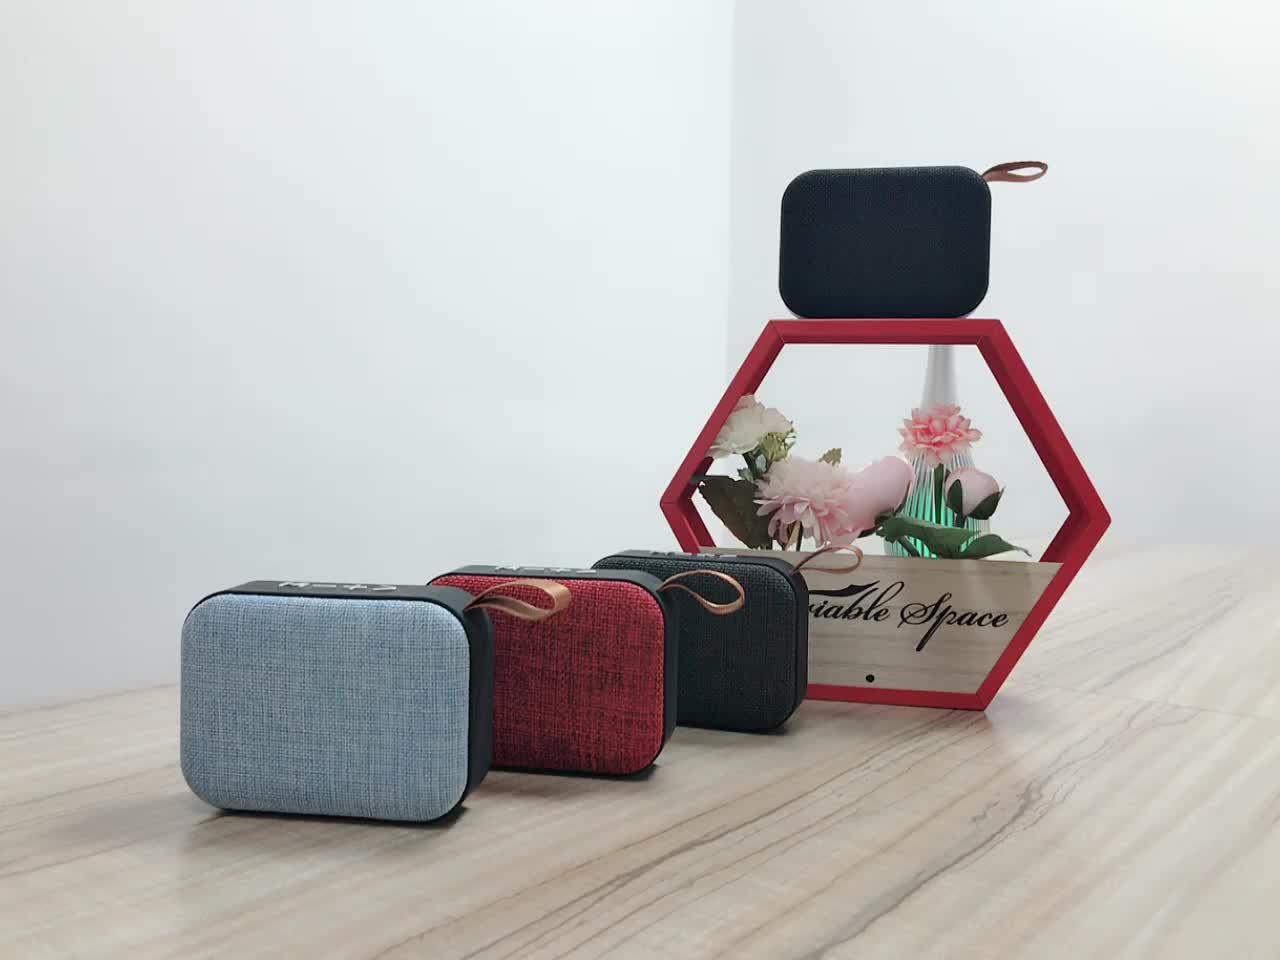 Outdoor Series Speaker by JRT Powerful Sound Box Mini Waterproof Bluetooth Fabric Cover Speaker